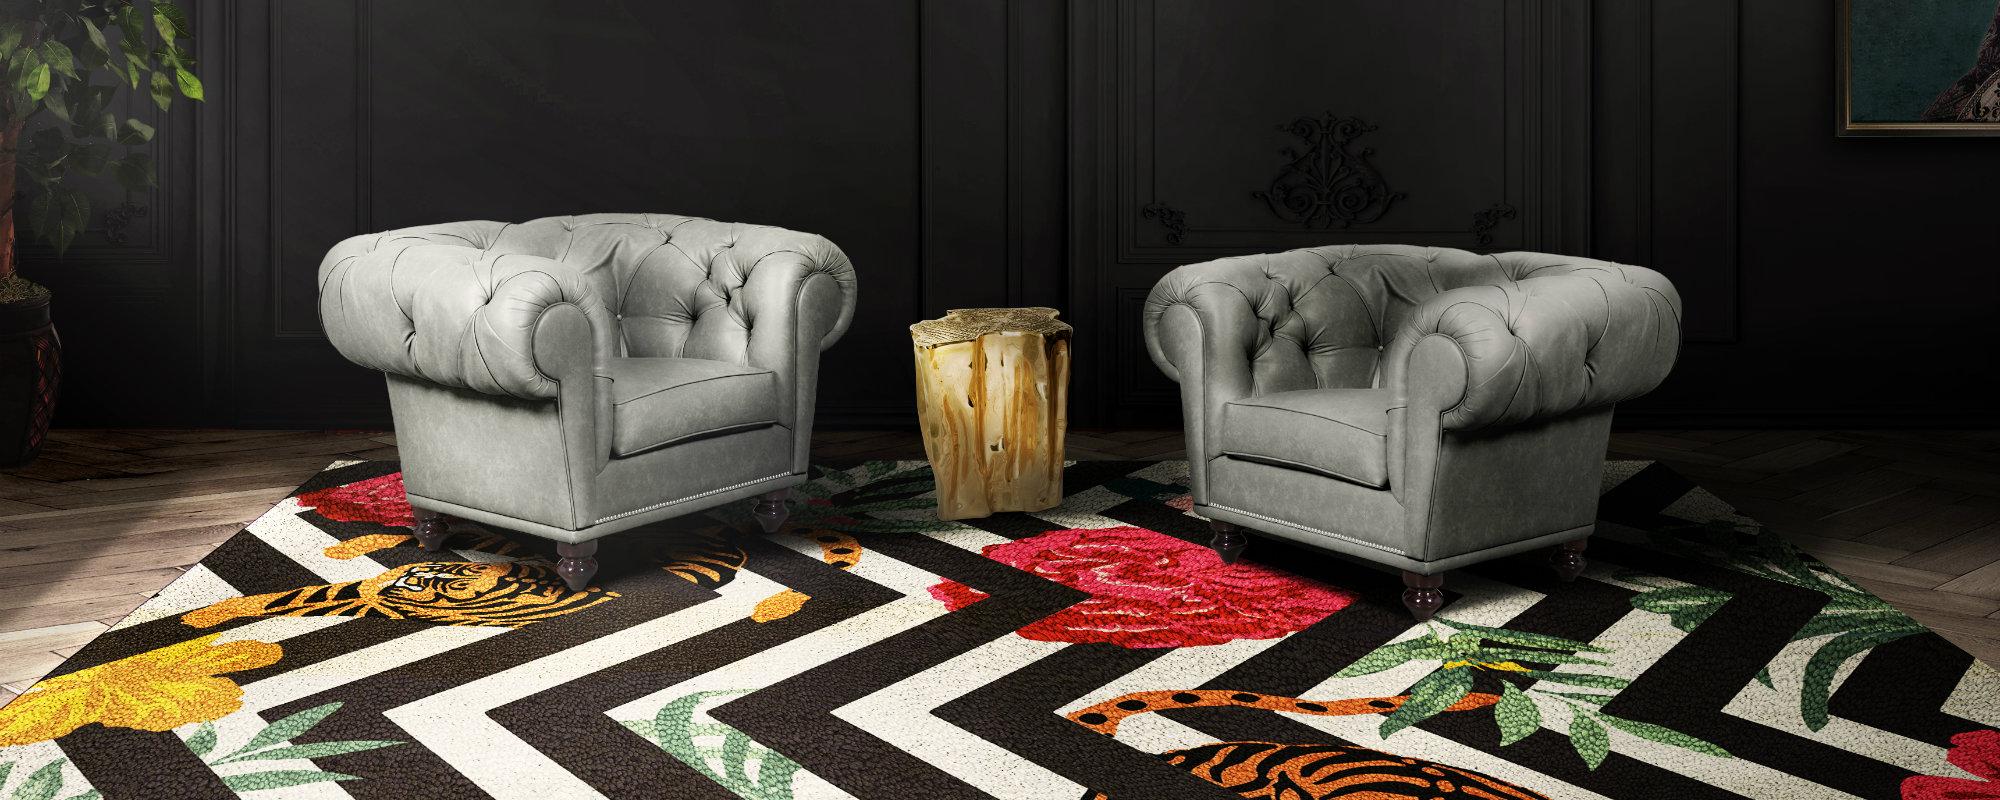 tendencias para decorar Tendencias para decorar: Rug Society una vision maravillosa Feature 4